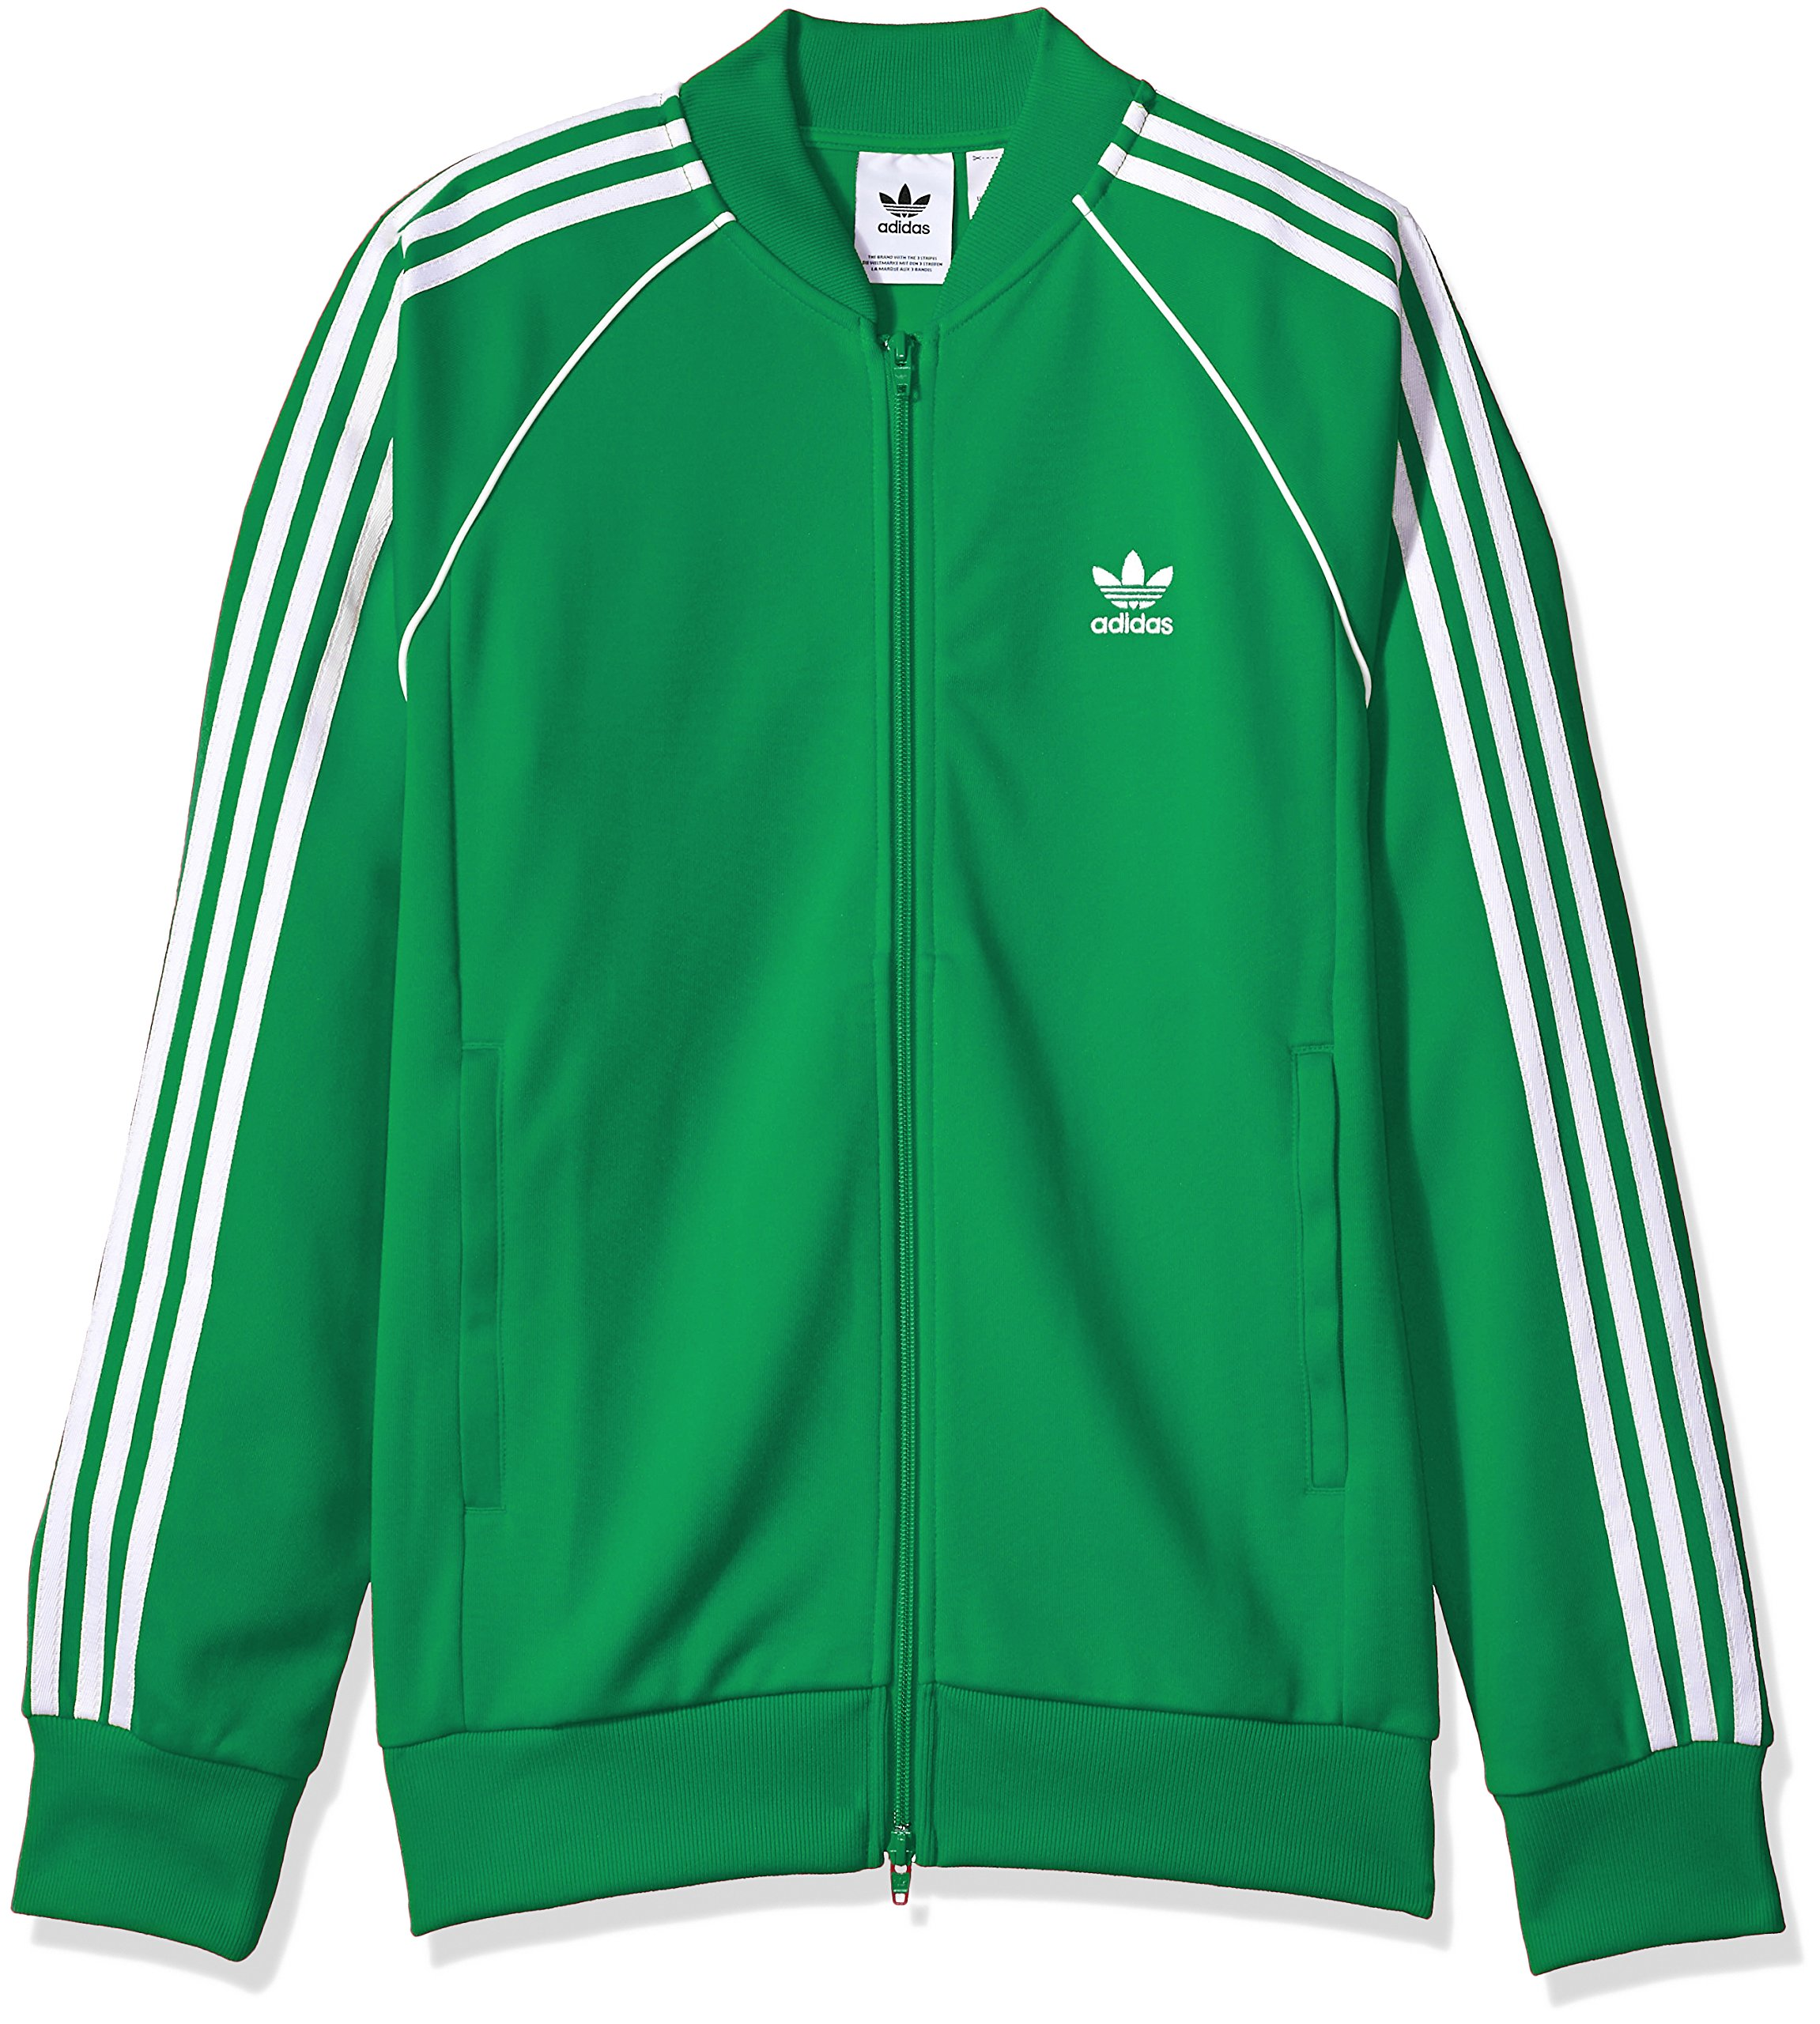 8982d326 Galleon - Adidas Originals Men's Superstar Track Jacket, Green, M